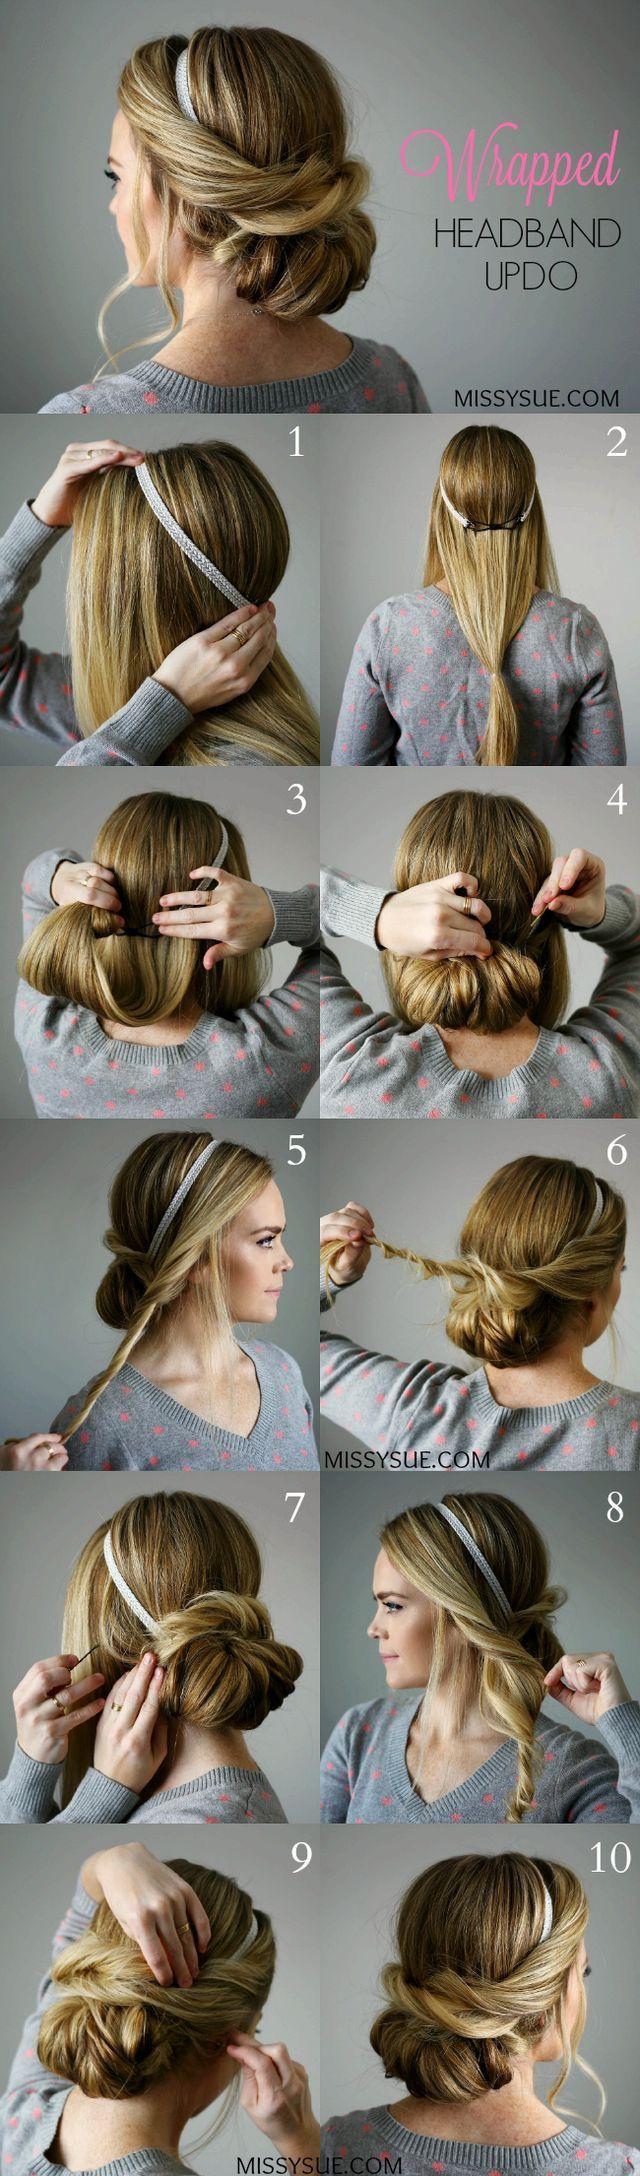 Плетенные прически hair pinterest hair style makeup and updos